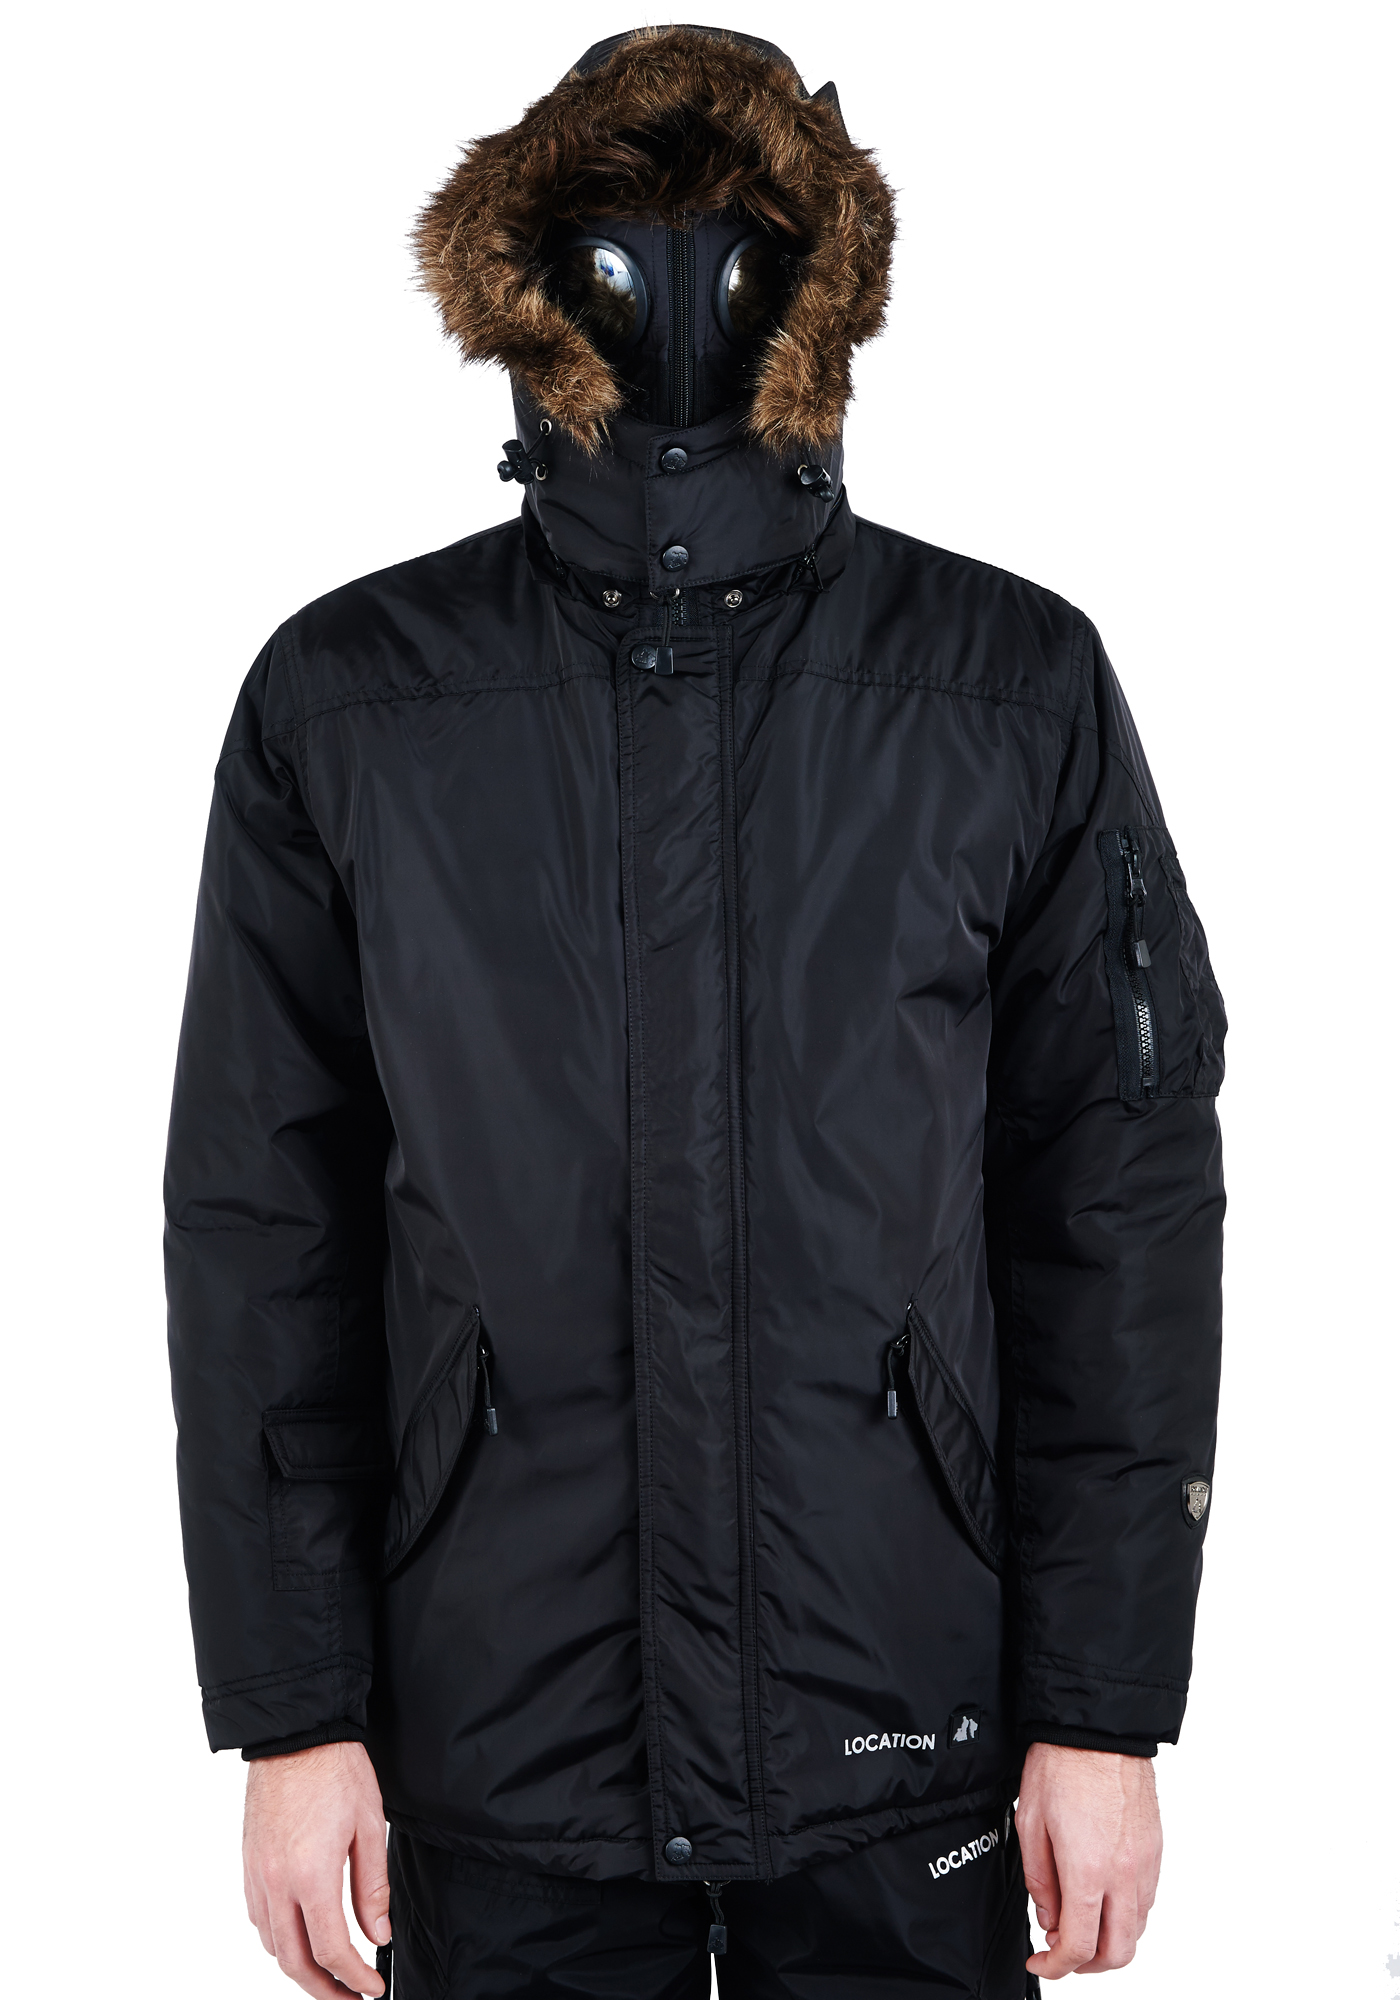 0e19833f49d63 Mens Location Hunter Krigs One-10 Parka Jacket Waterproof Goggle Coat Winter